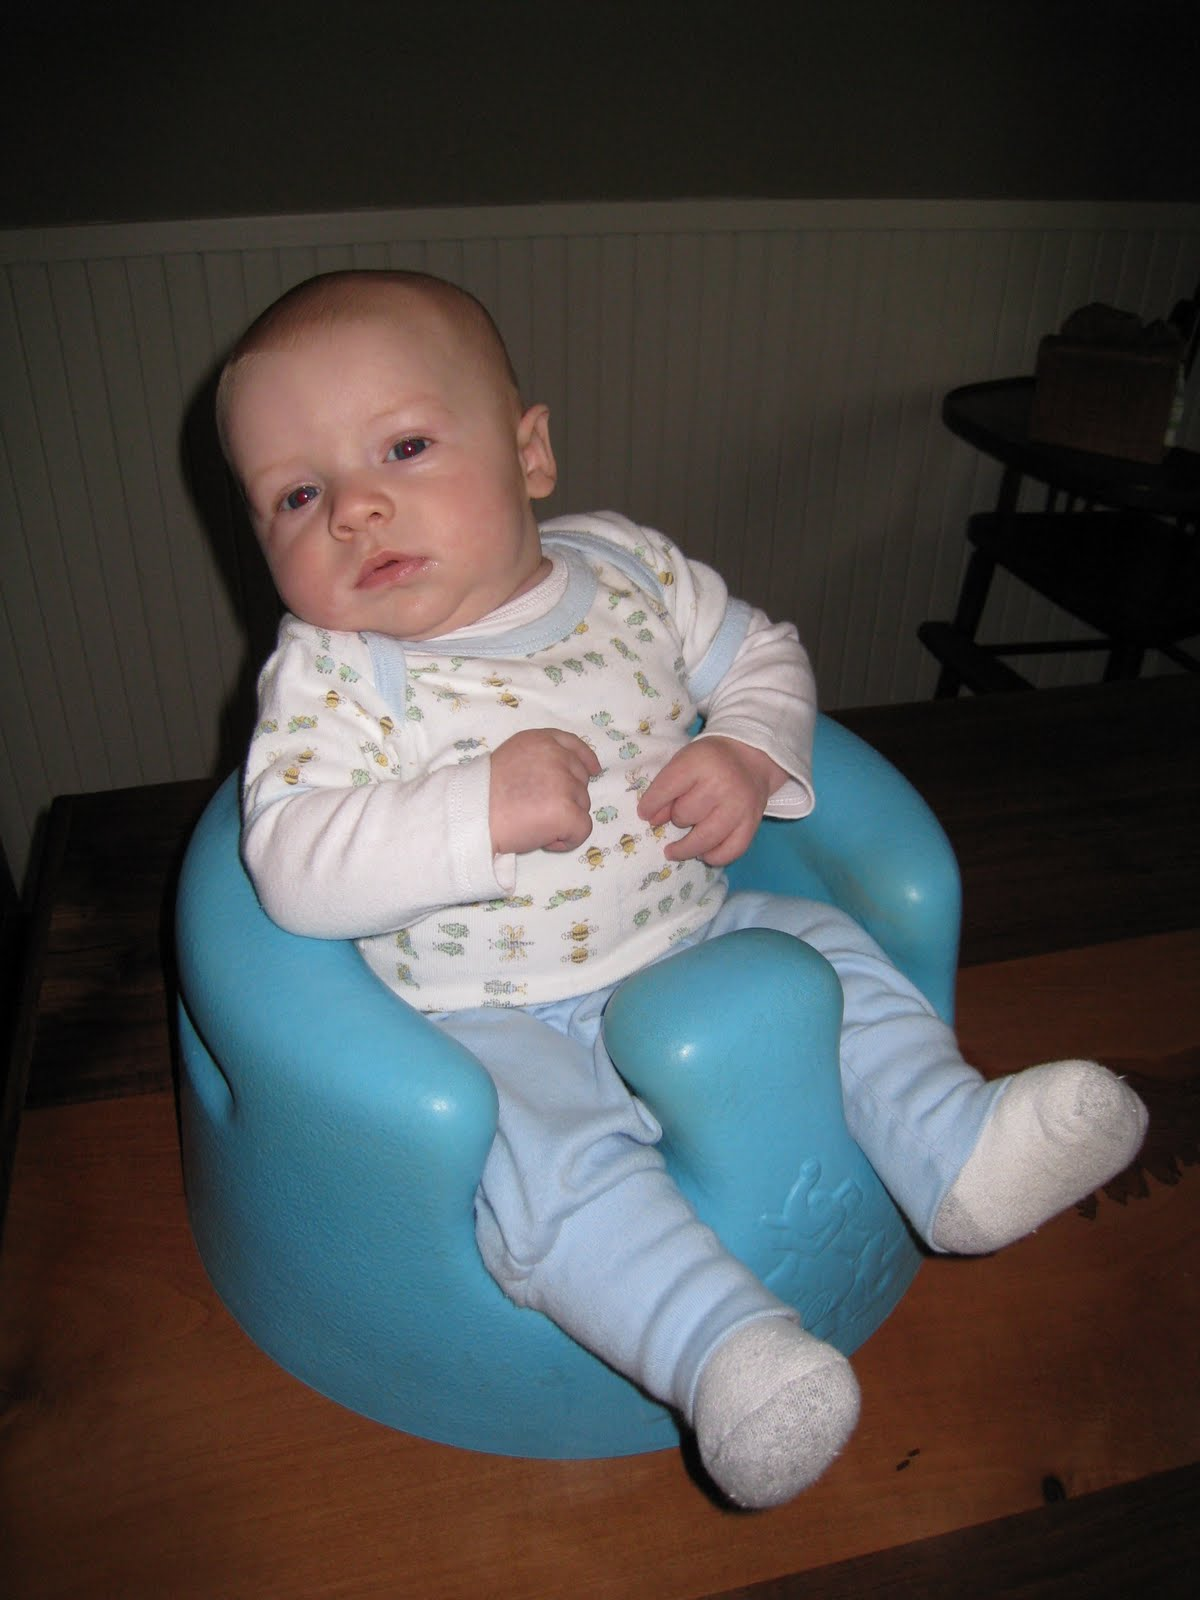 Daniel & Heather & The Kids: The Bumbo Chair..